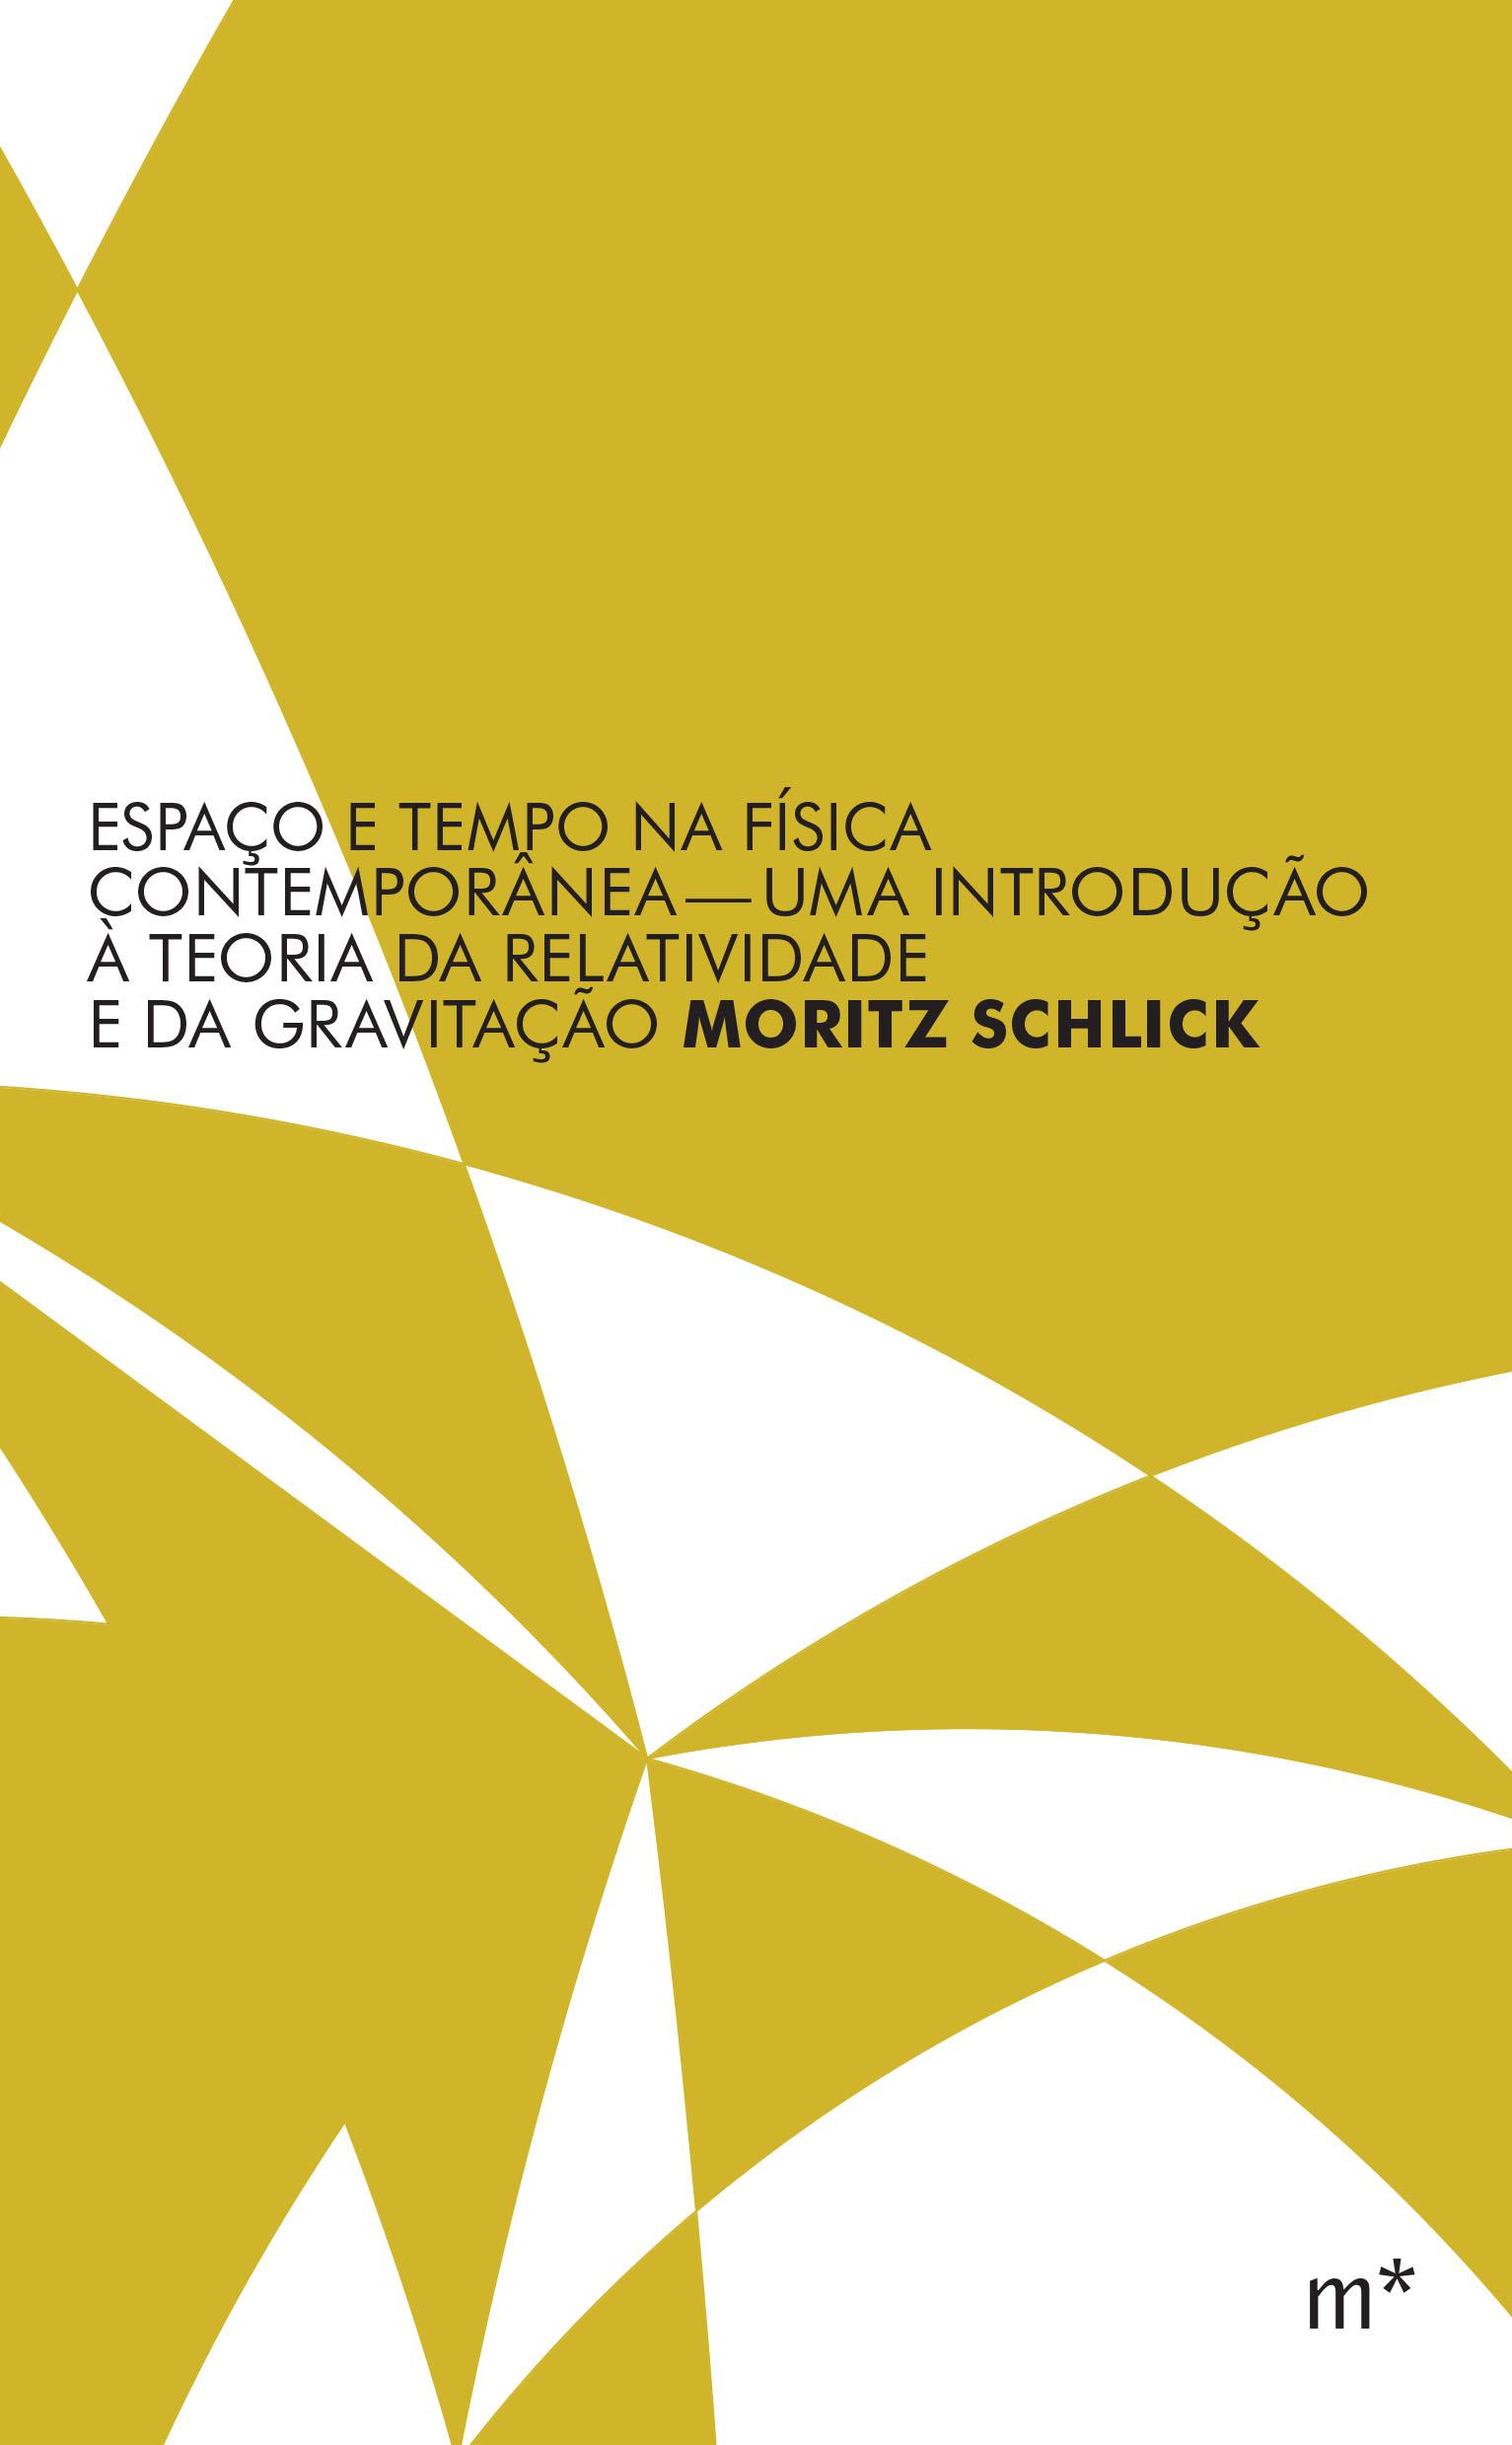 Espaço e tempo na física contemporânea, livro de Moritz Schlick